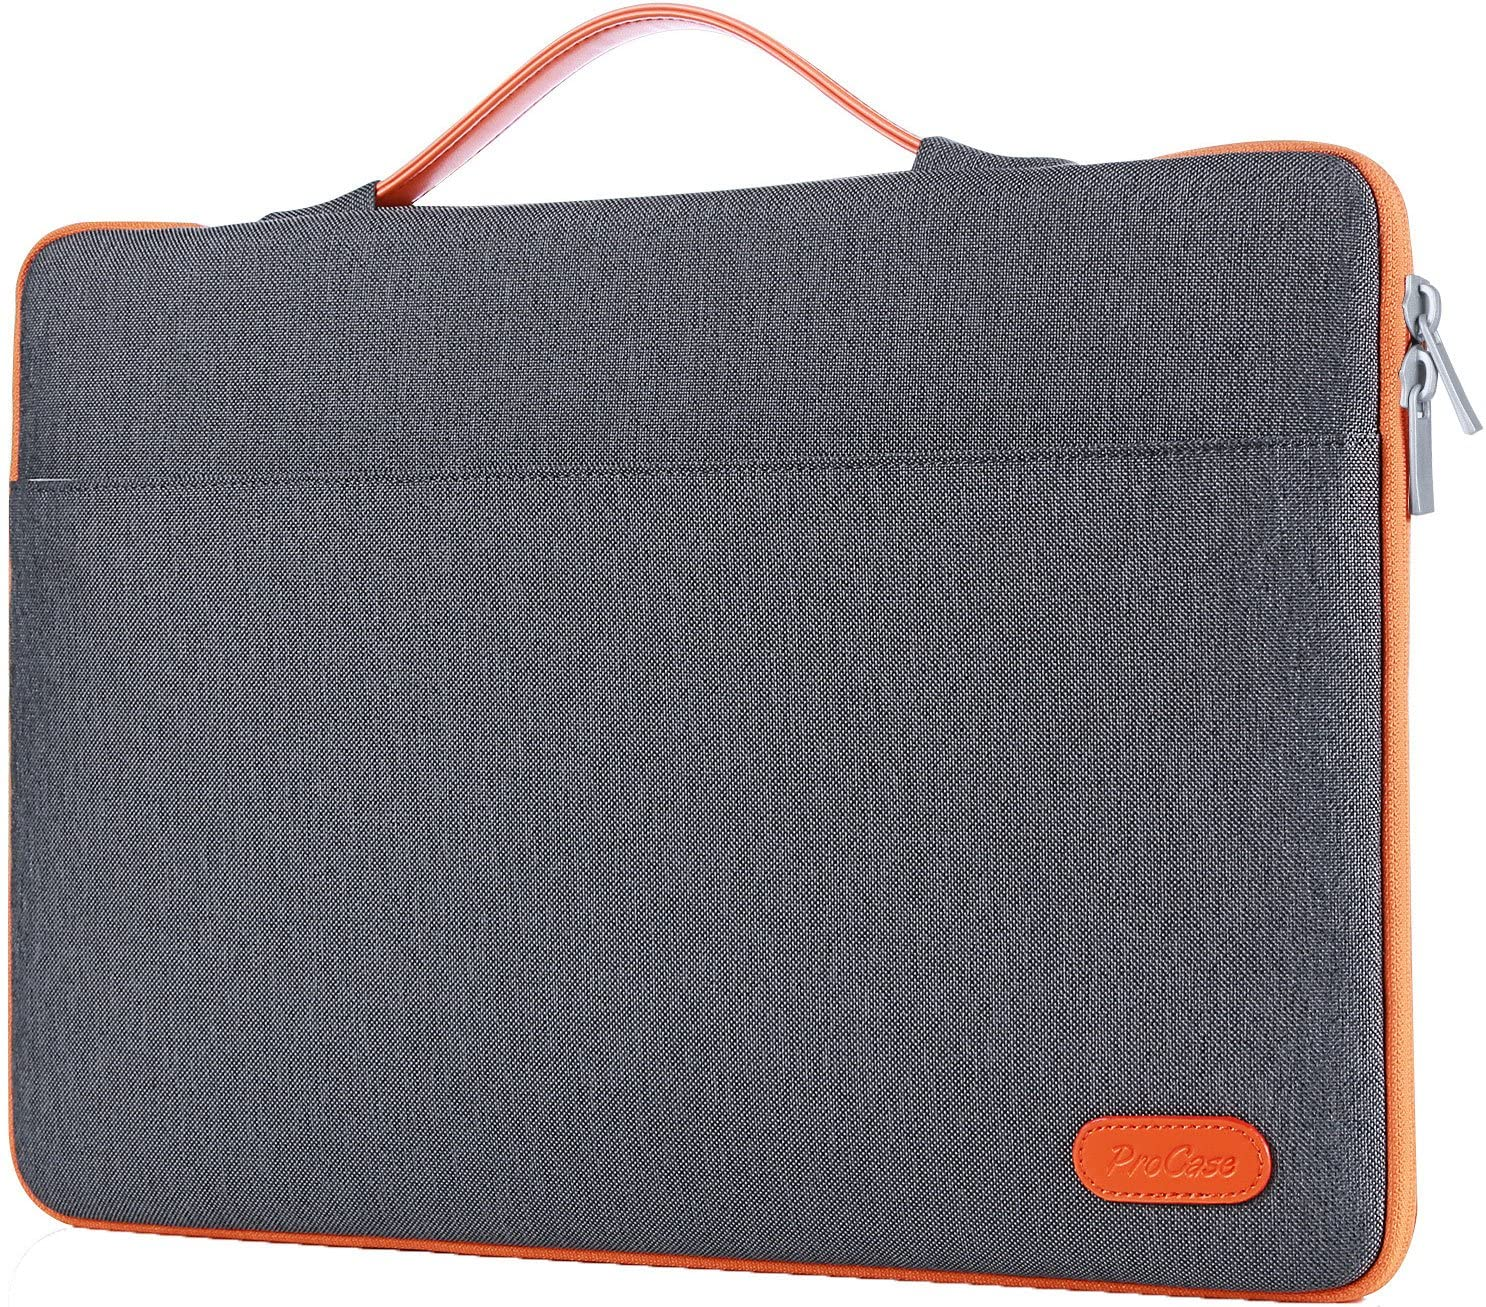 Procase Laptop Sleeve